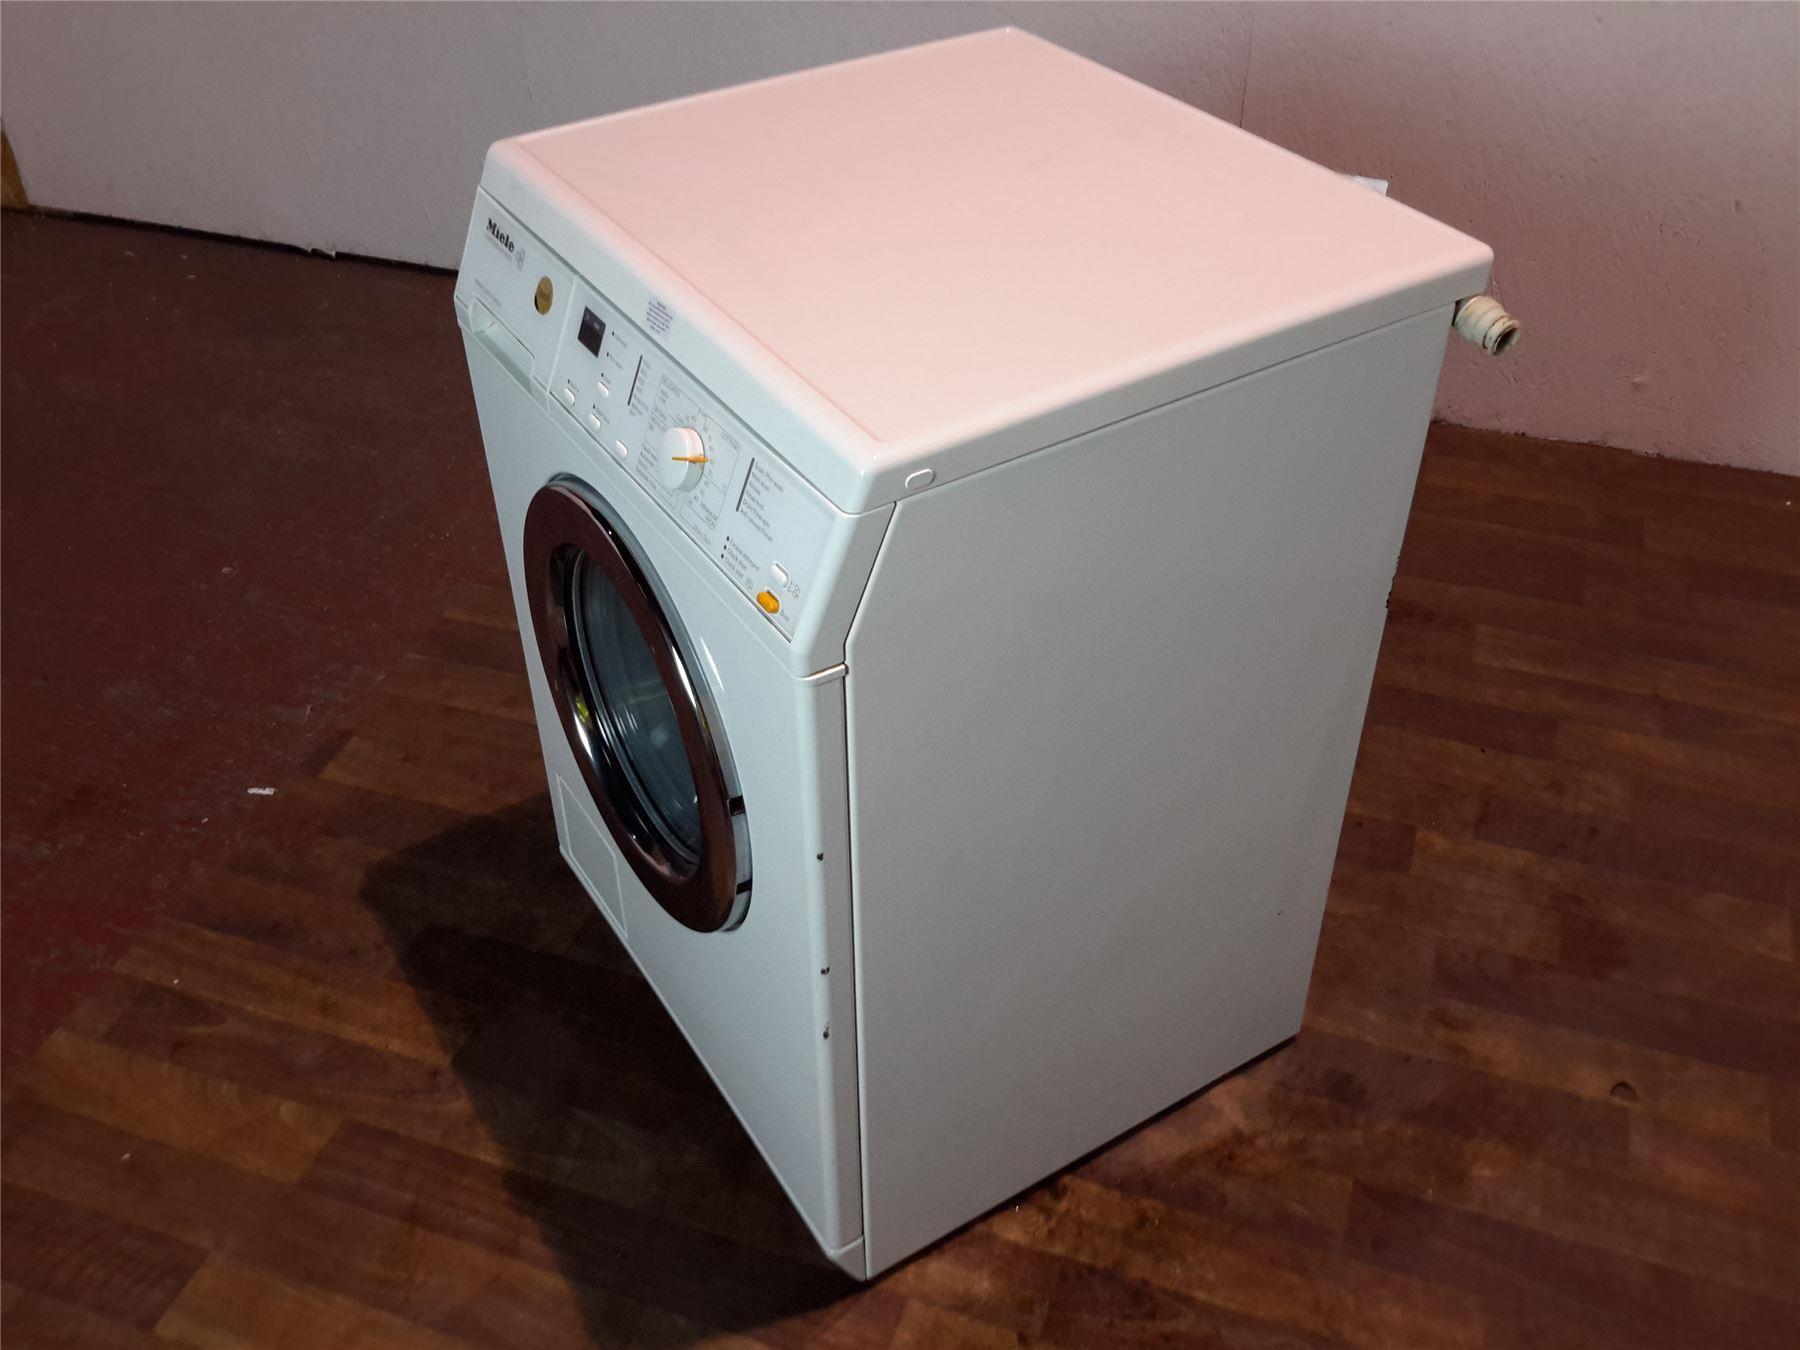 miele w2203 washing machine freestanding front load 5kg. Black Bedroom Furniture Sets. Home Design Ideas